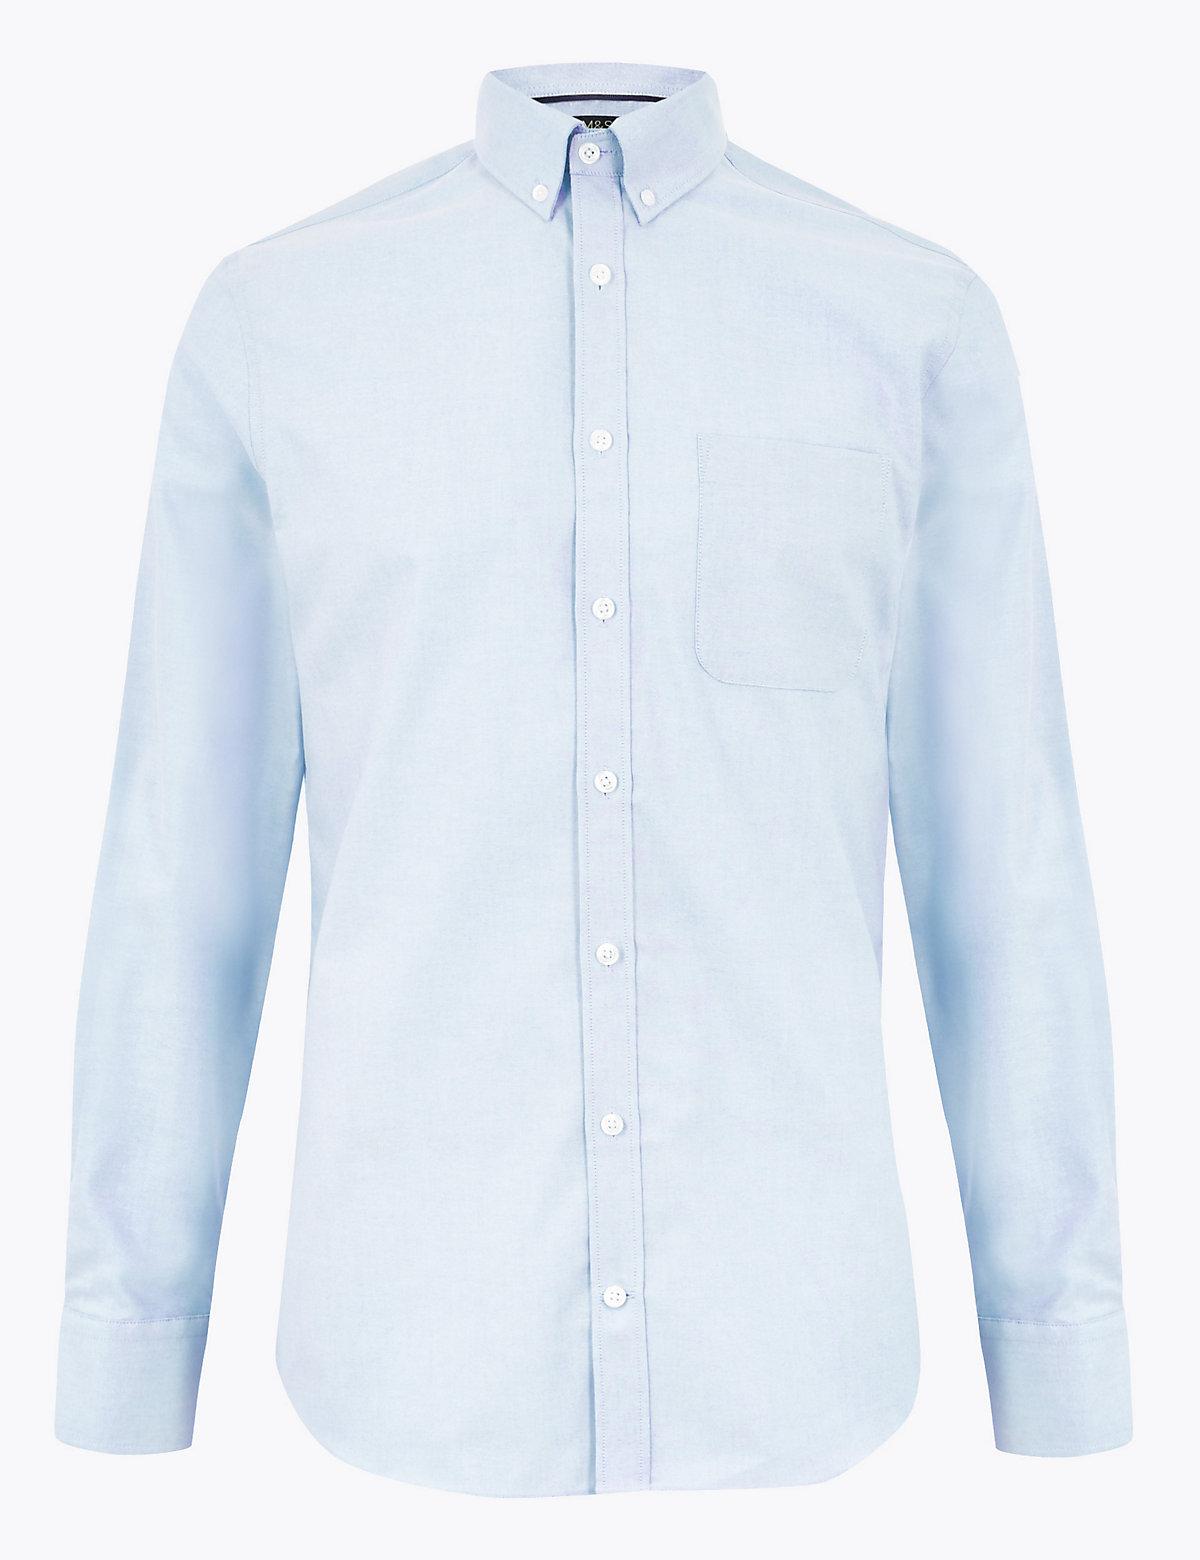 Хлопковая рубашка Oxford